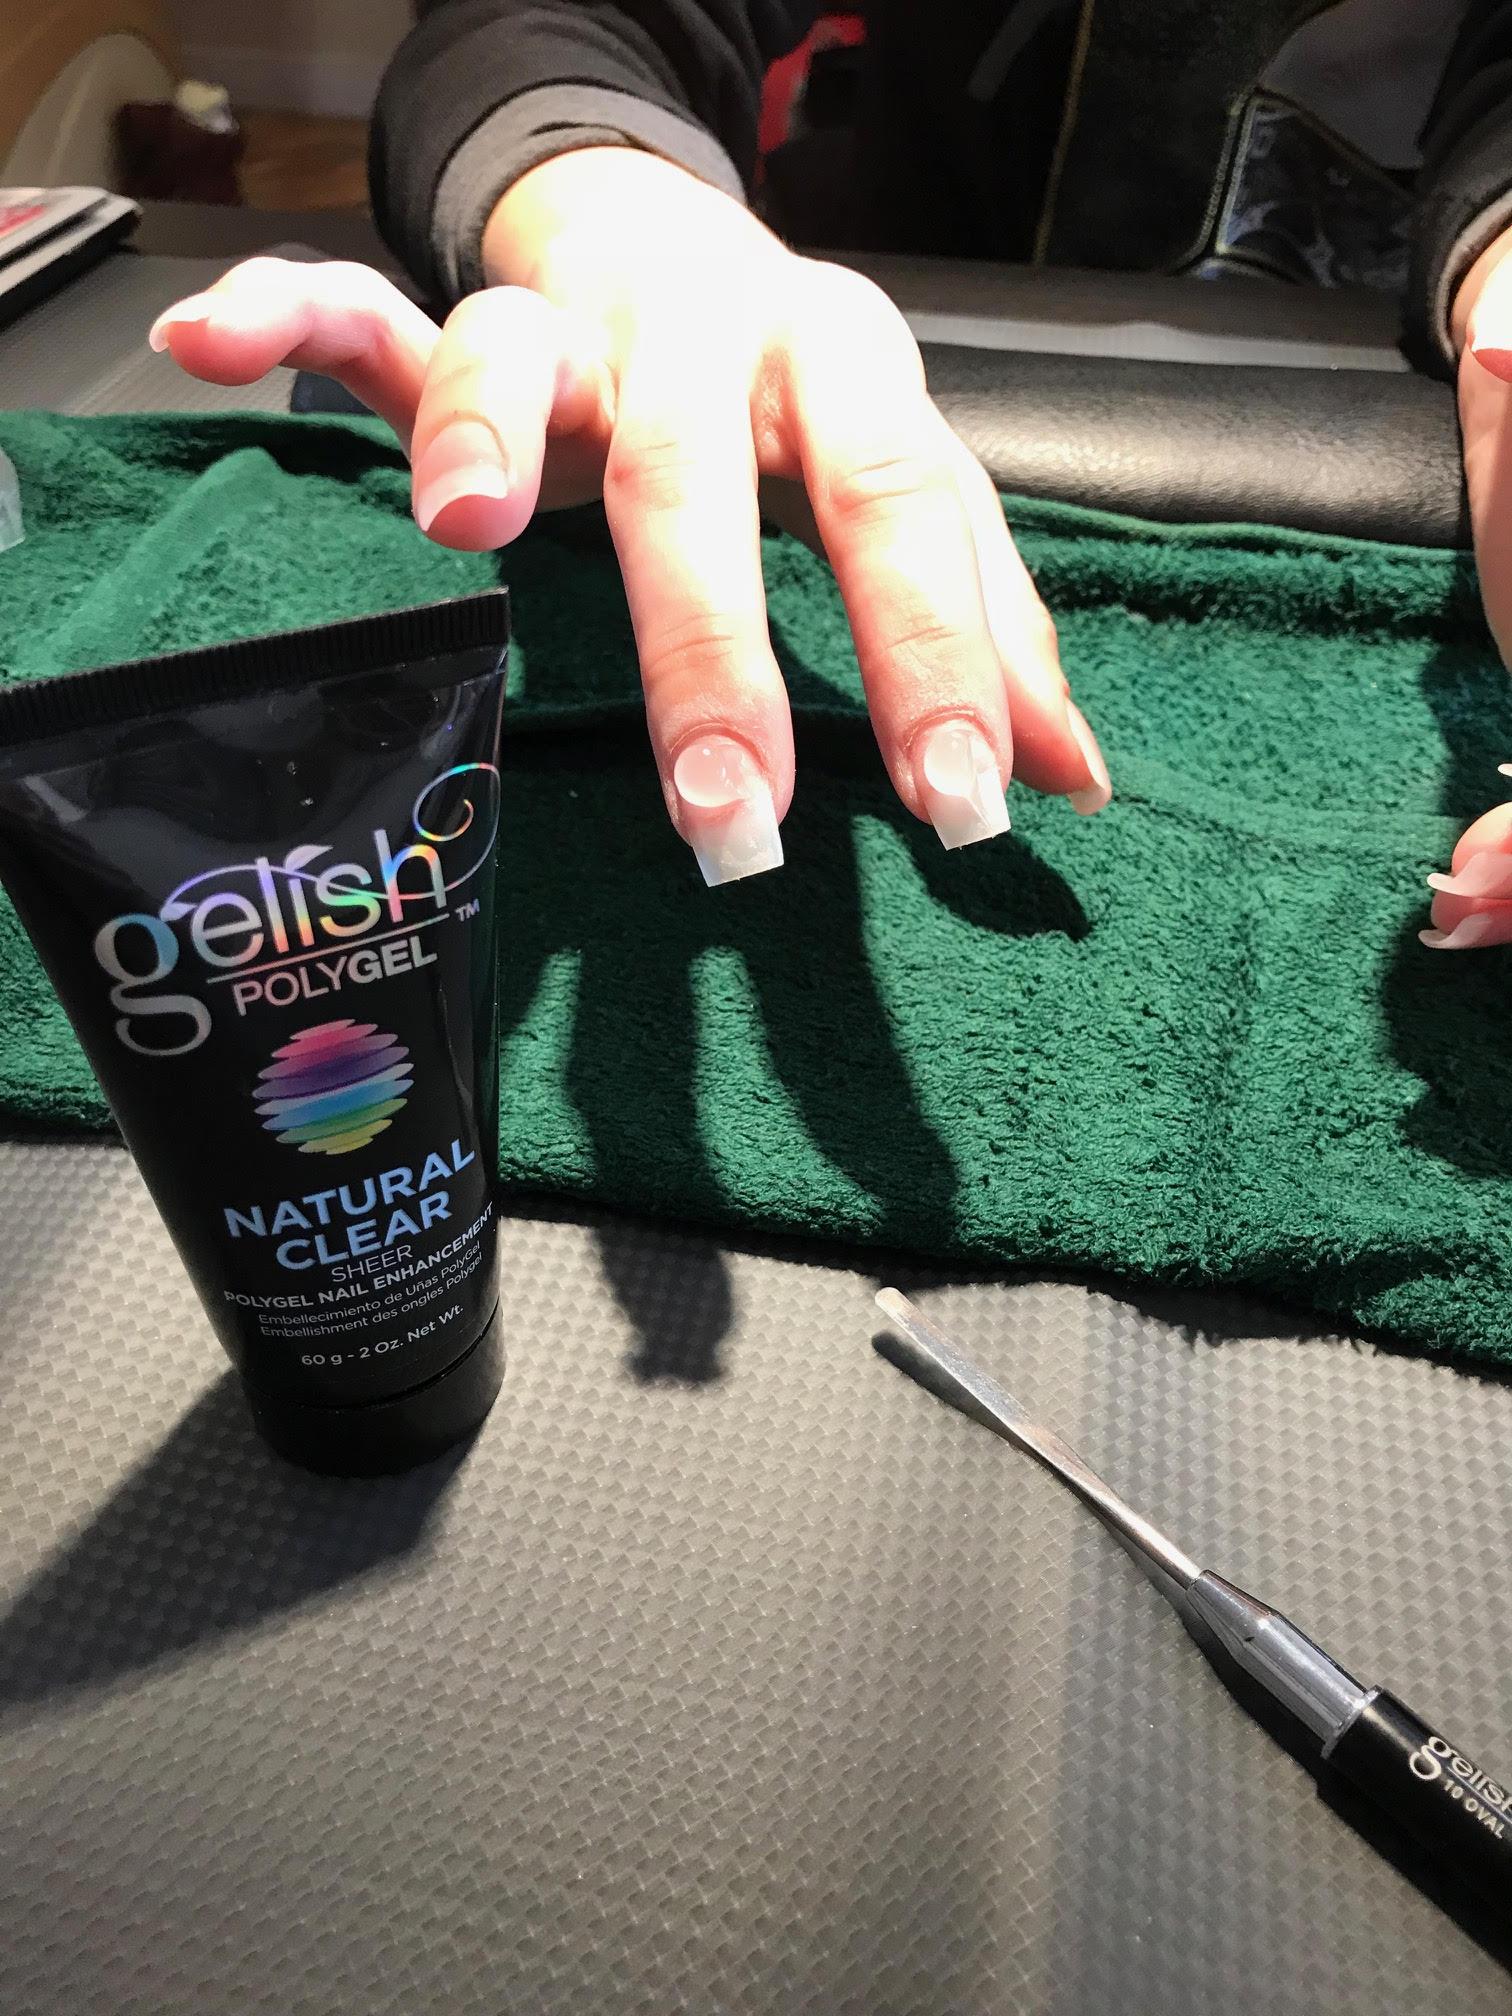 PolyGel Nail Enhancement